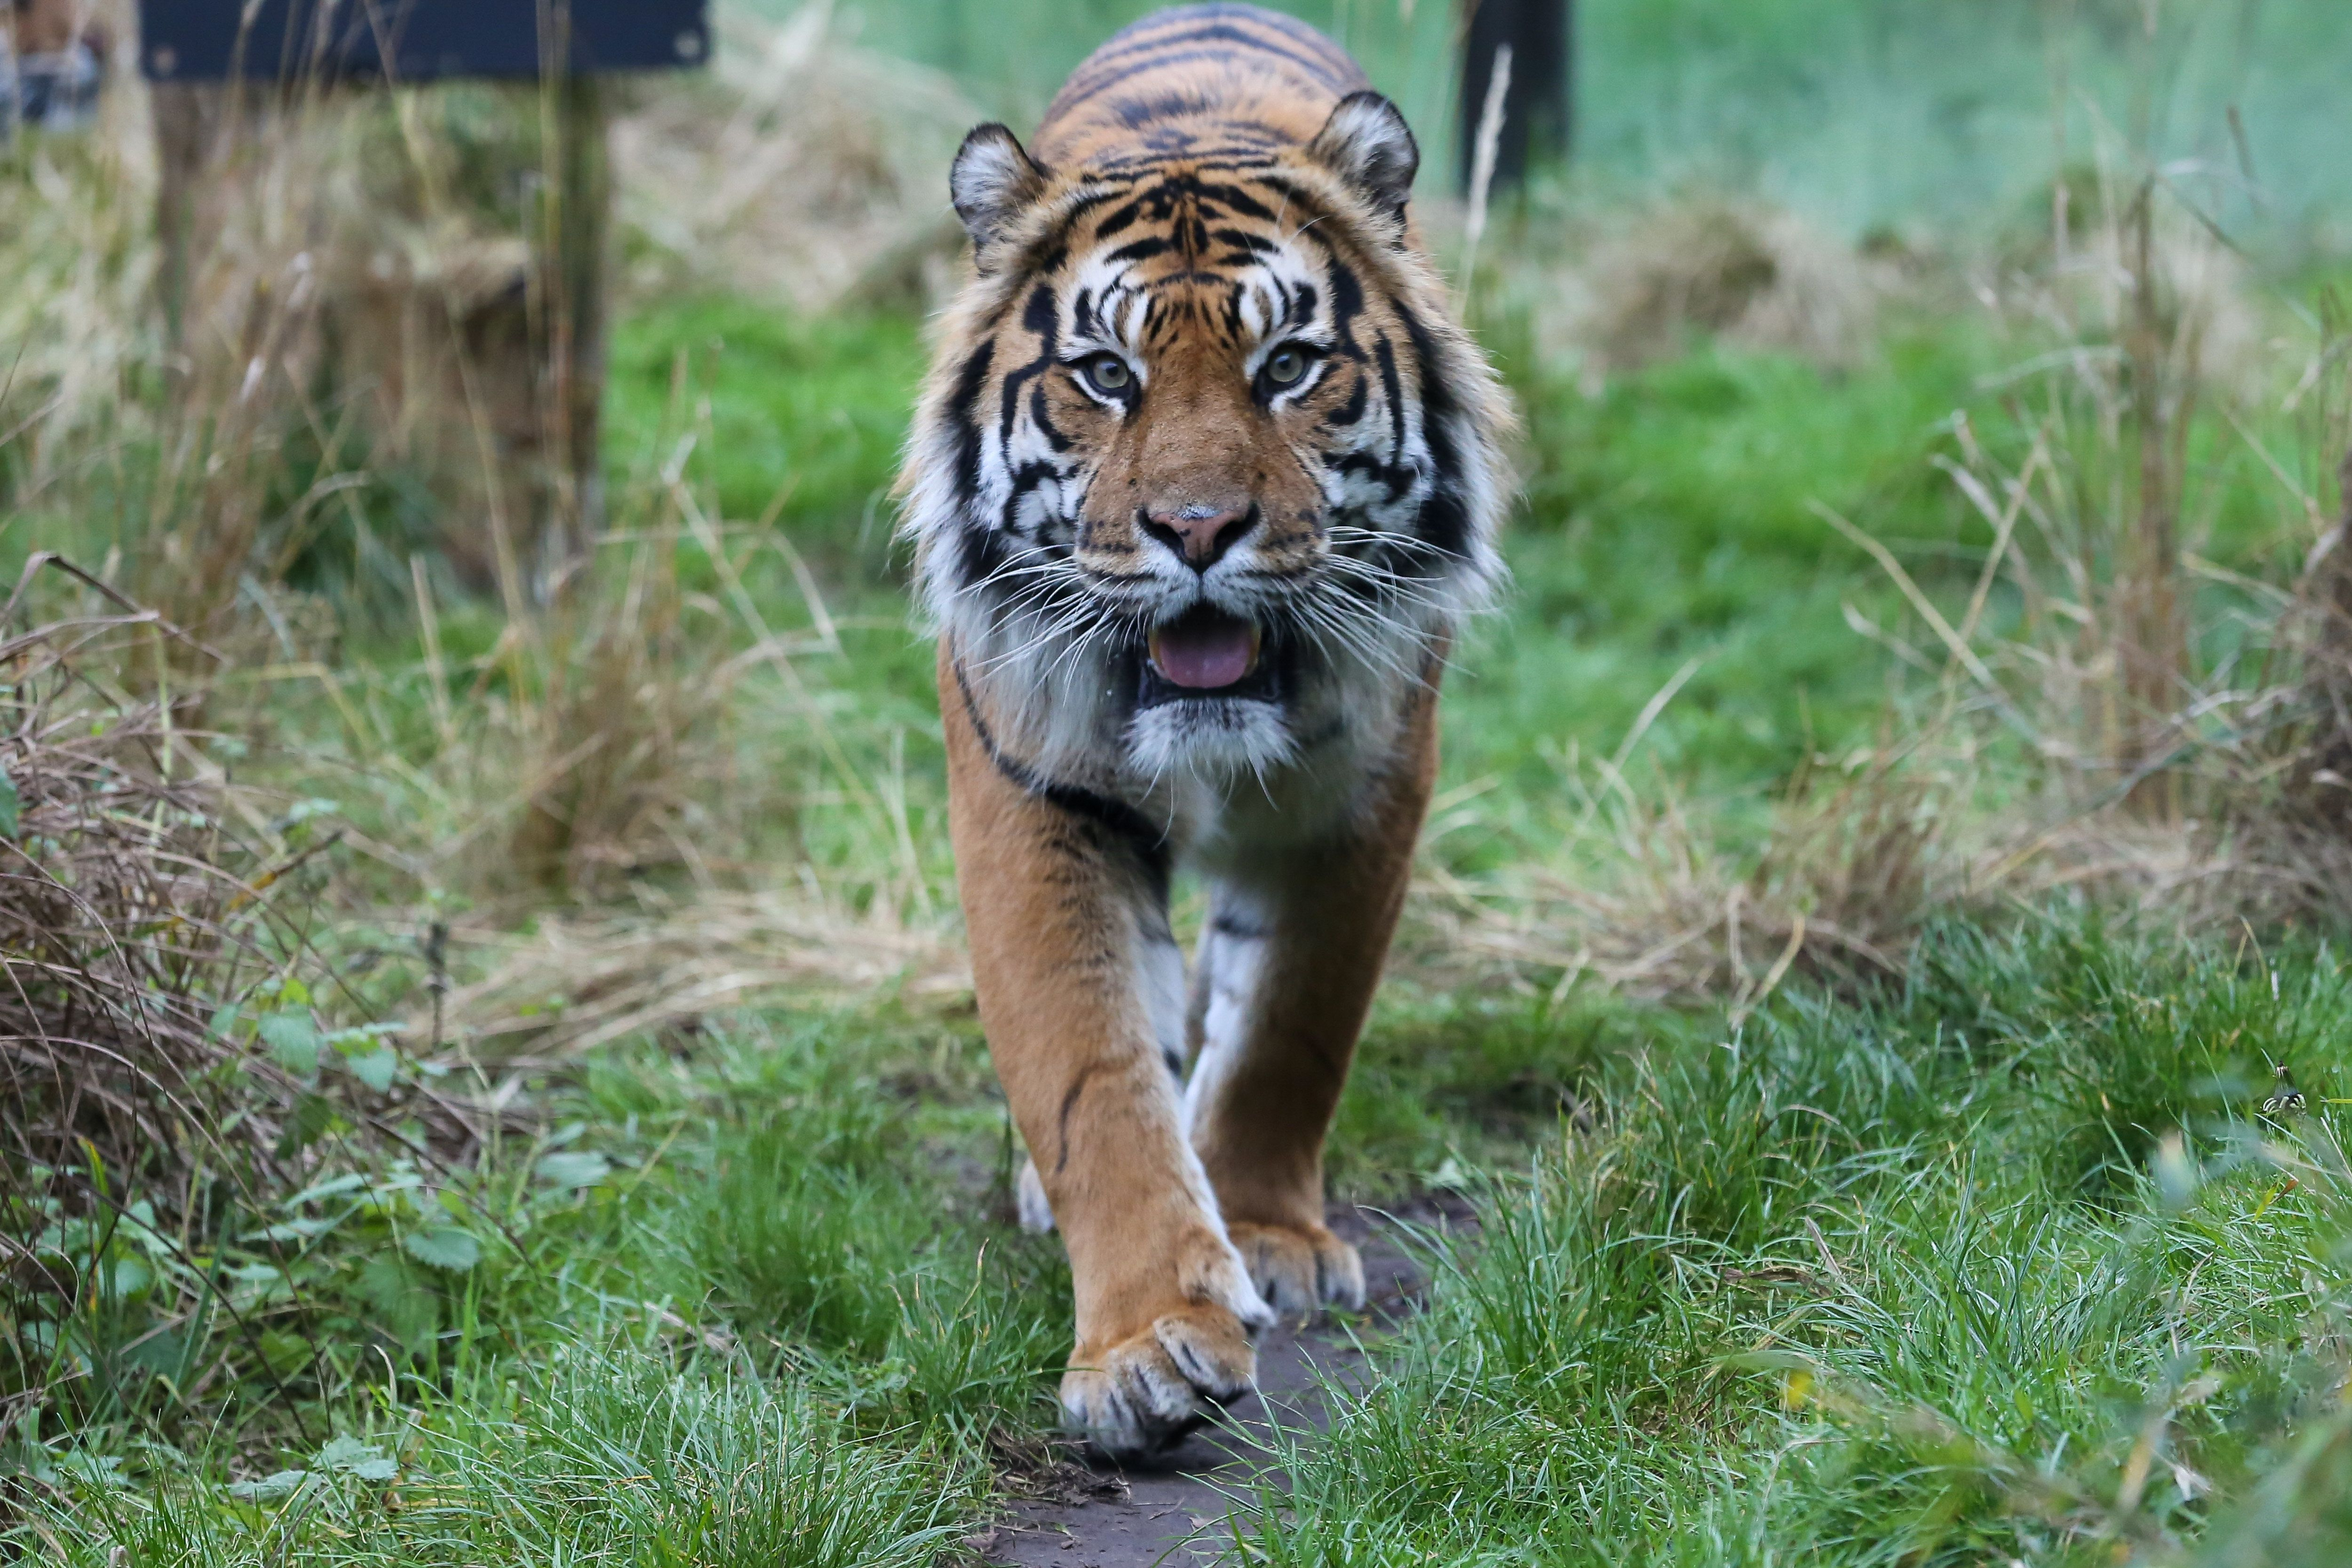 Popular Sumatran Tiger Melati Killed By Intended Mate At London